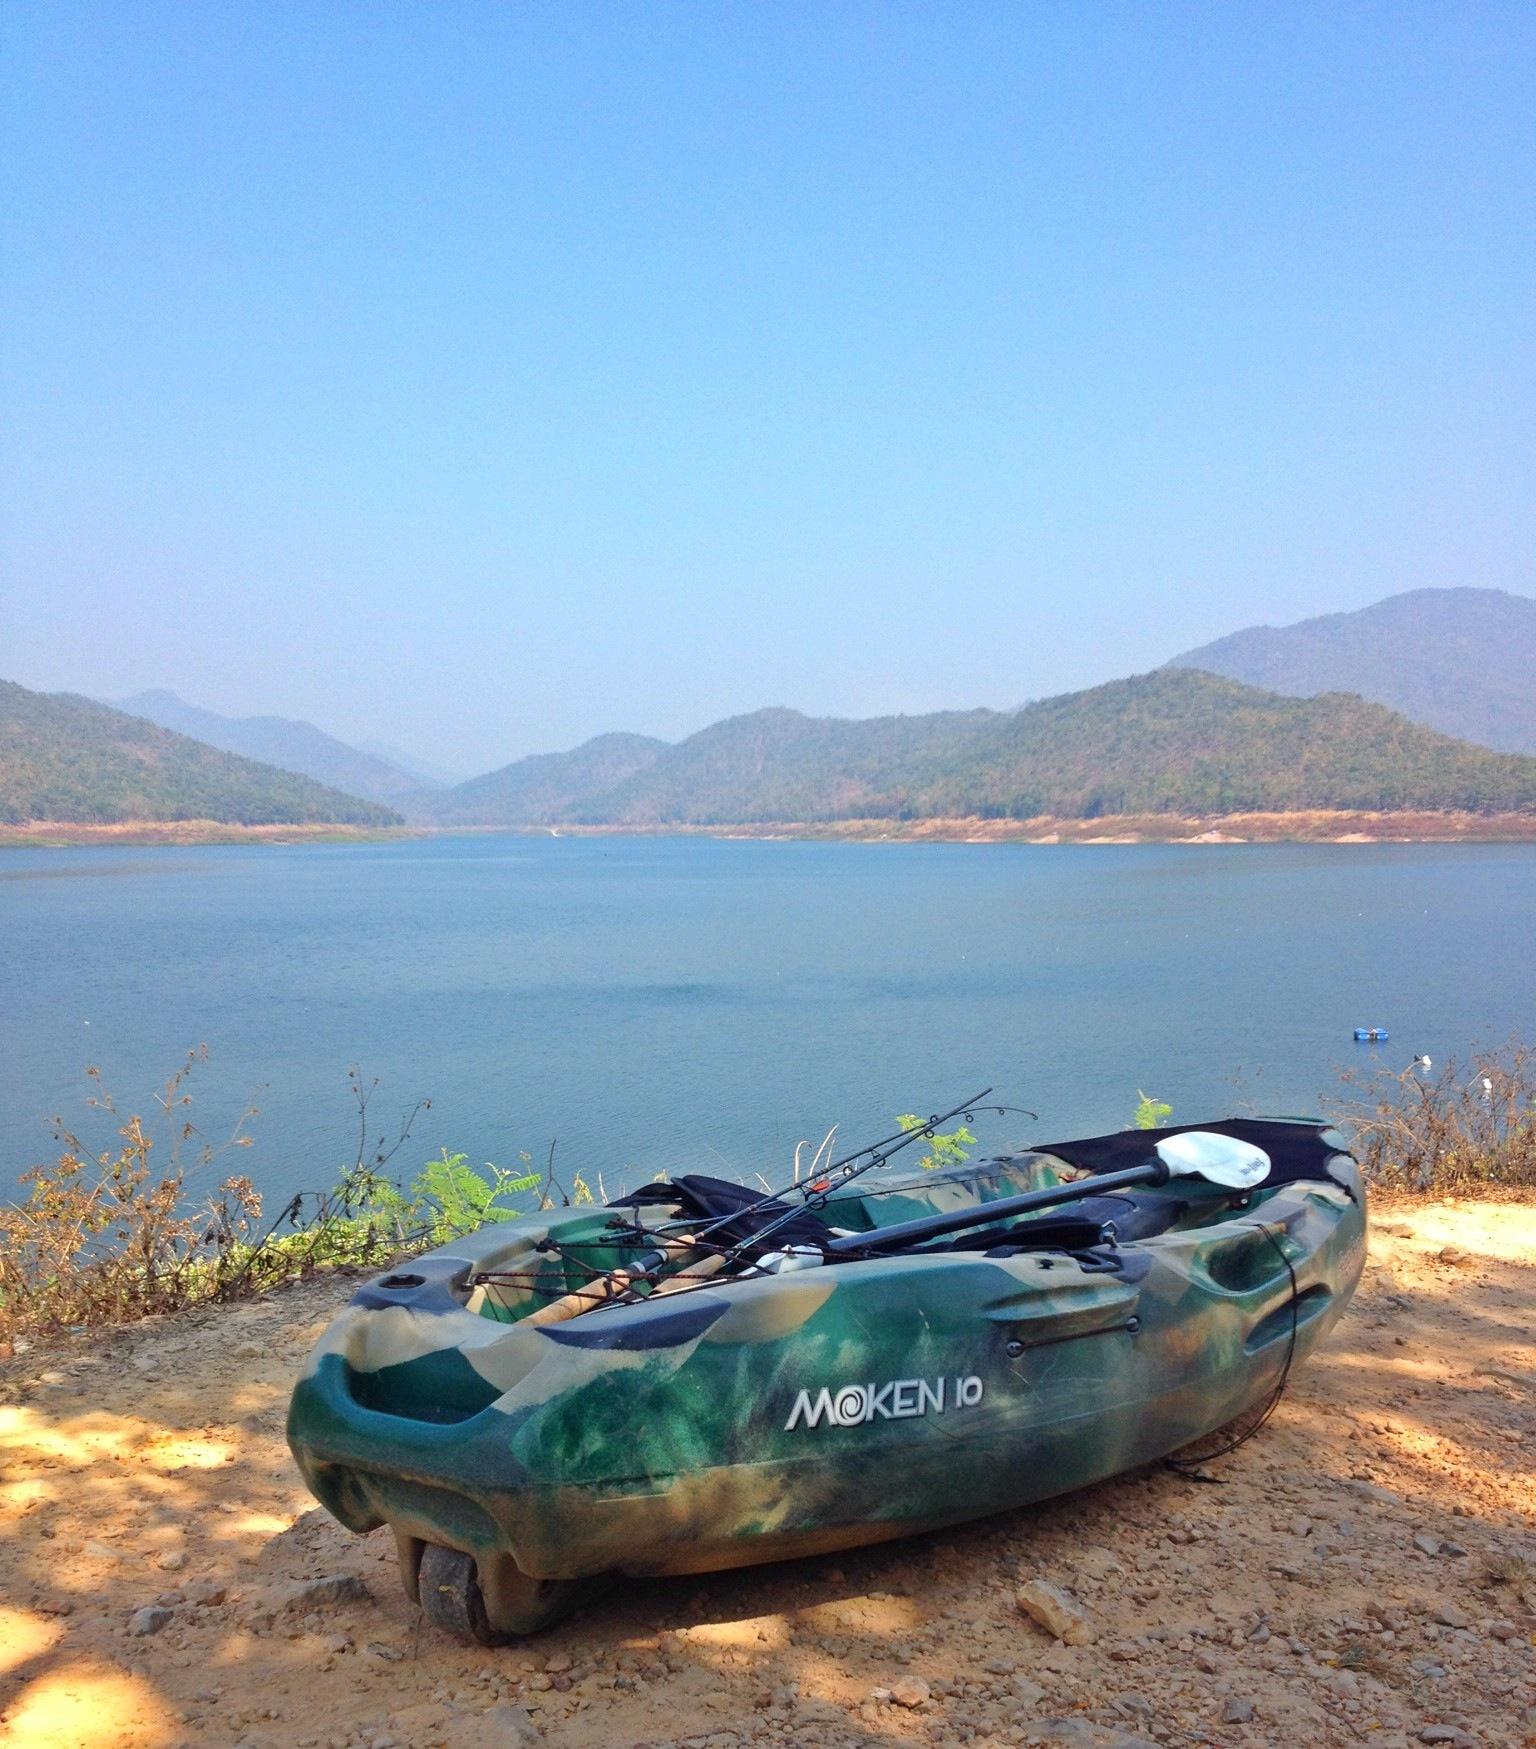 En tur på Mae Kuang Dam